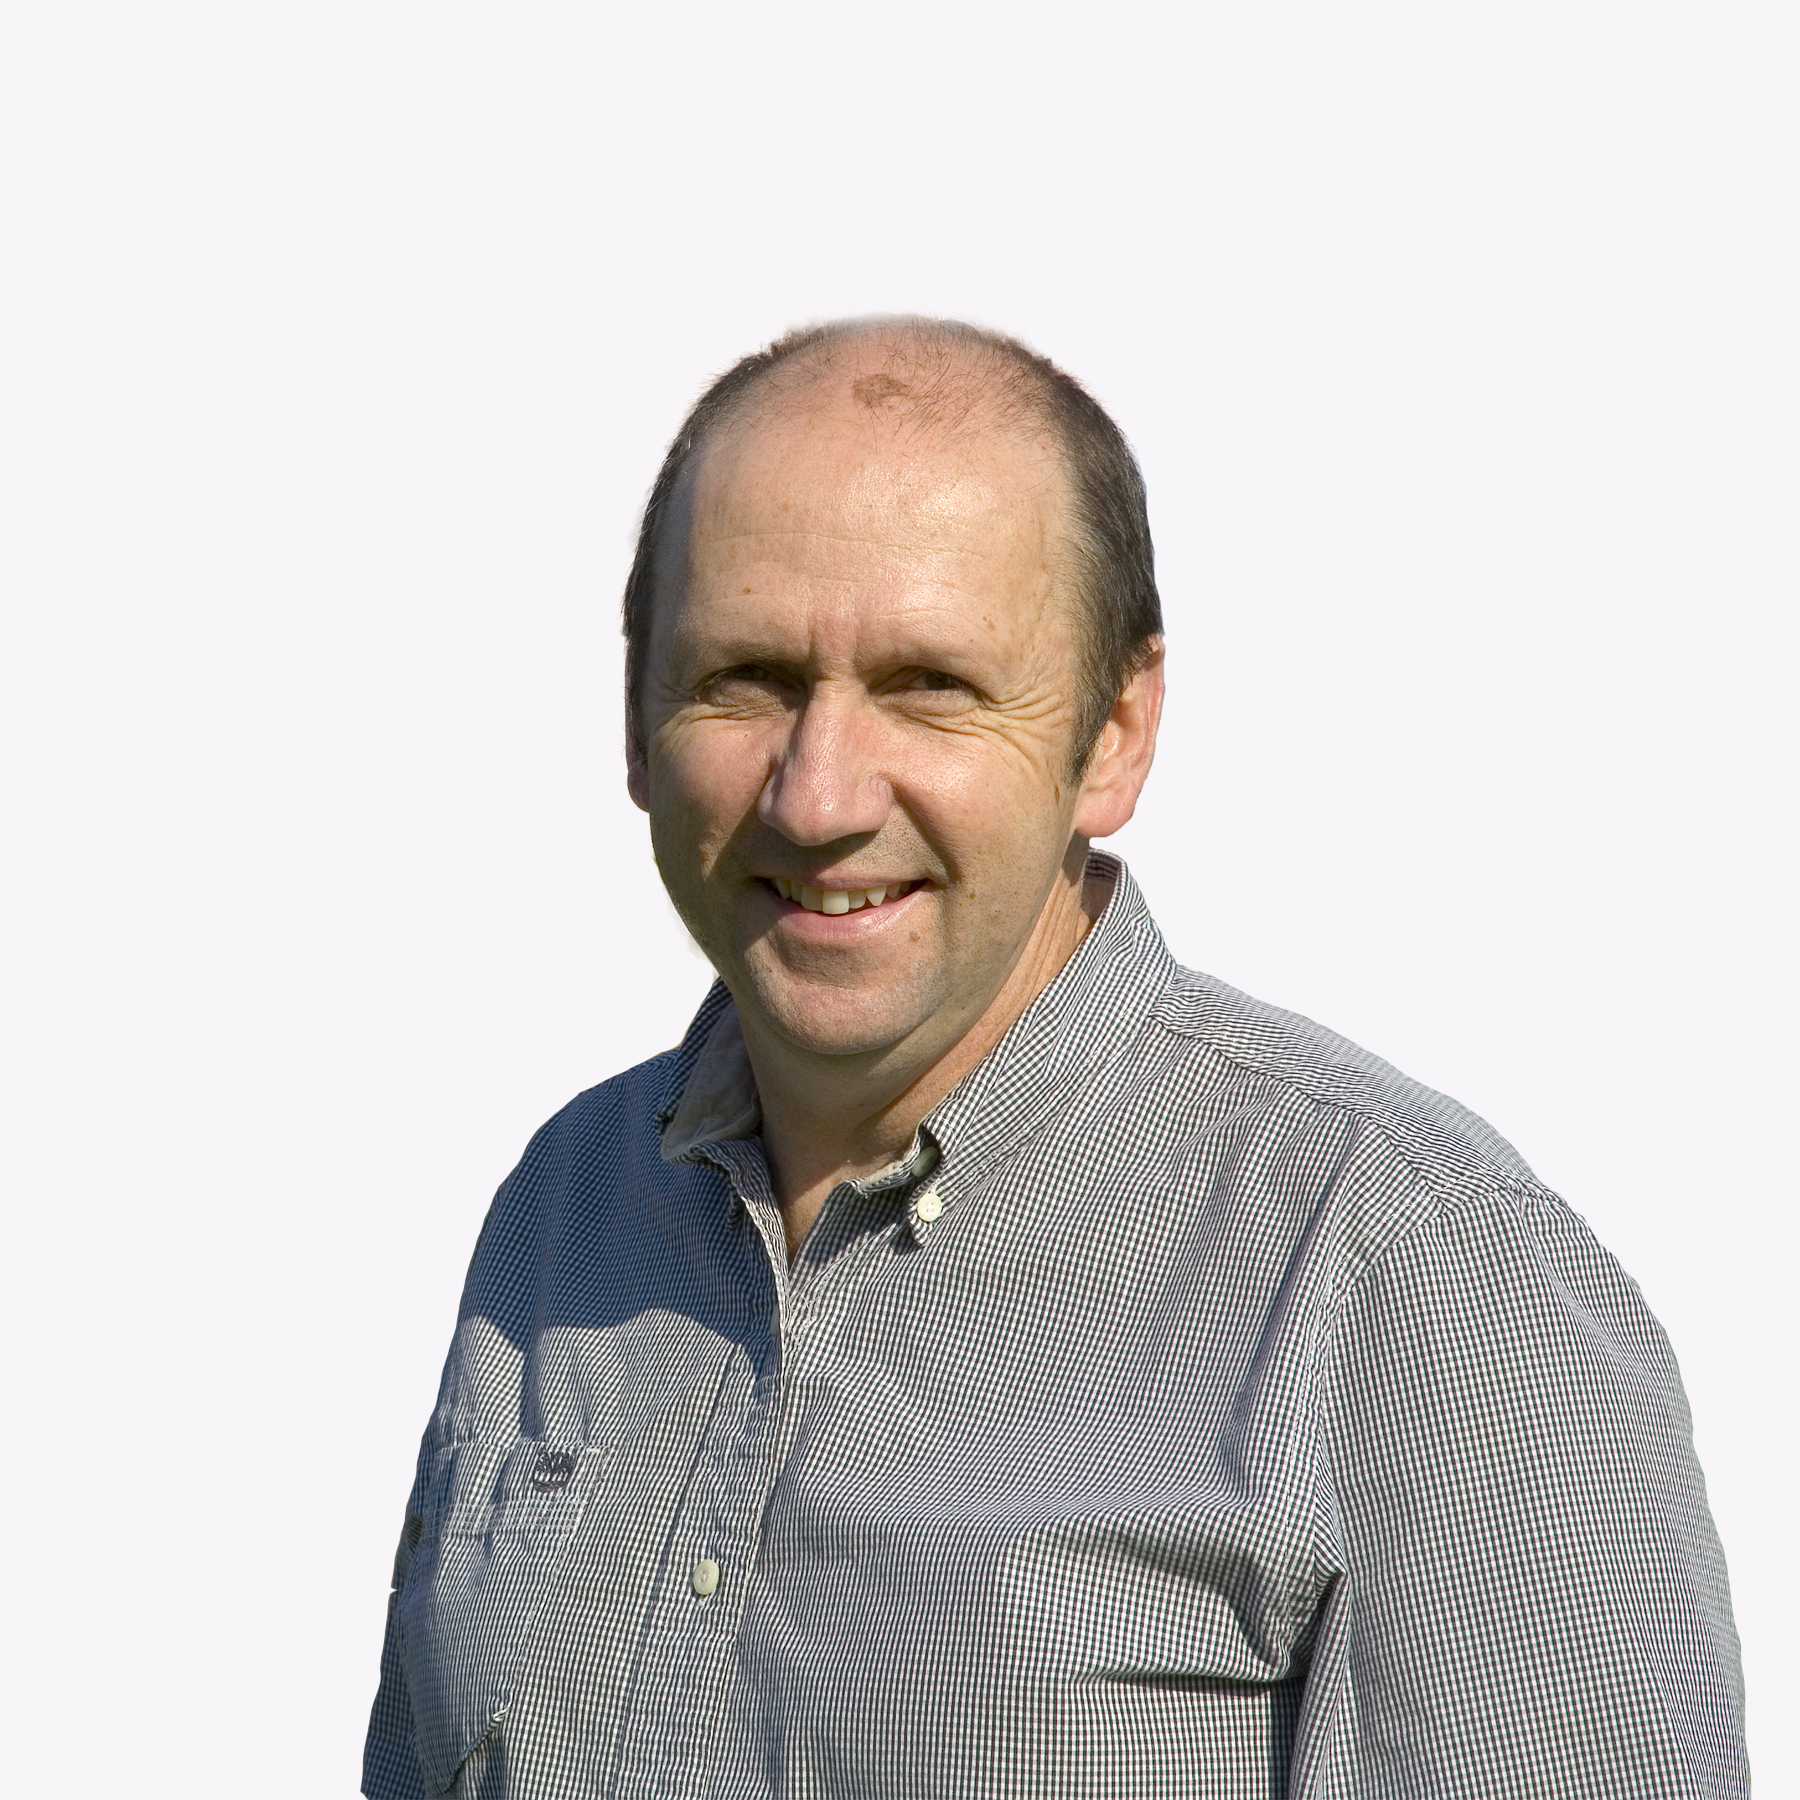 Clive Burlton